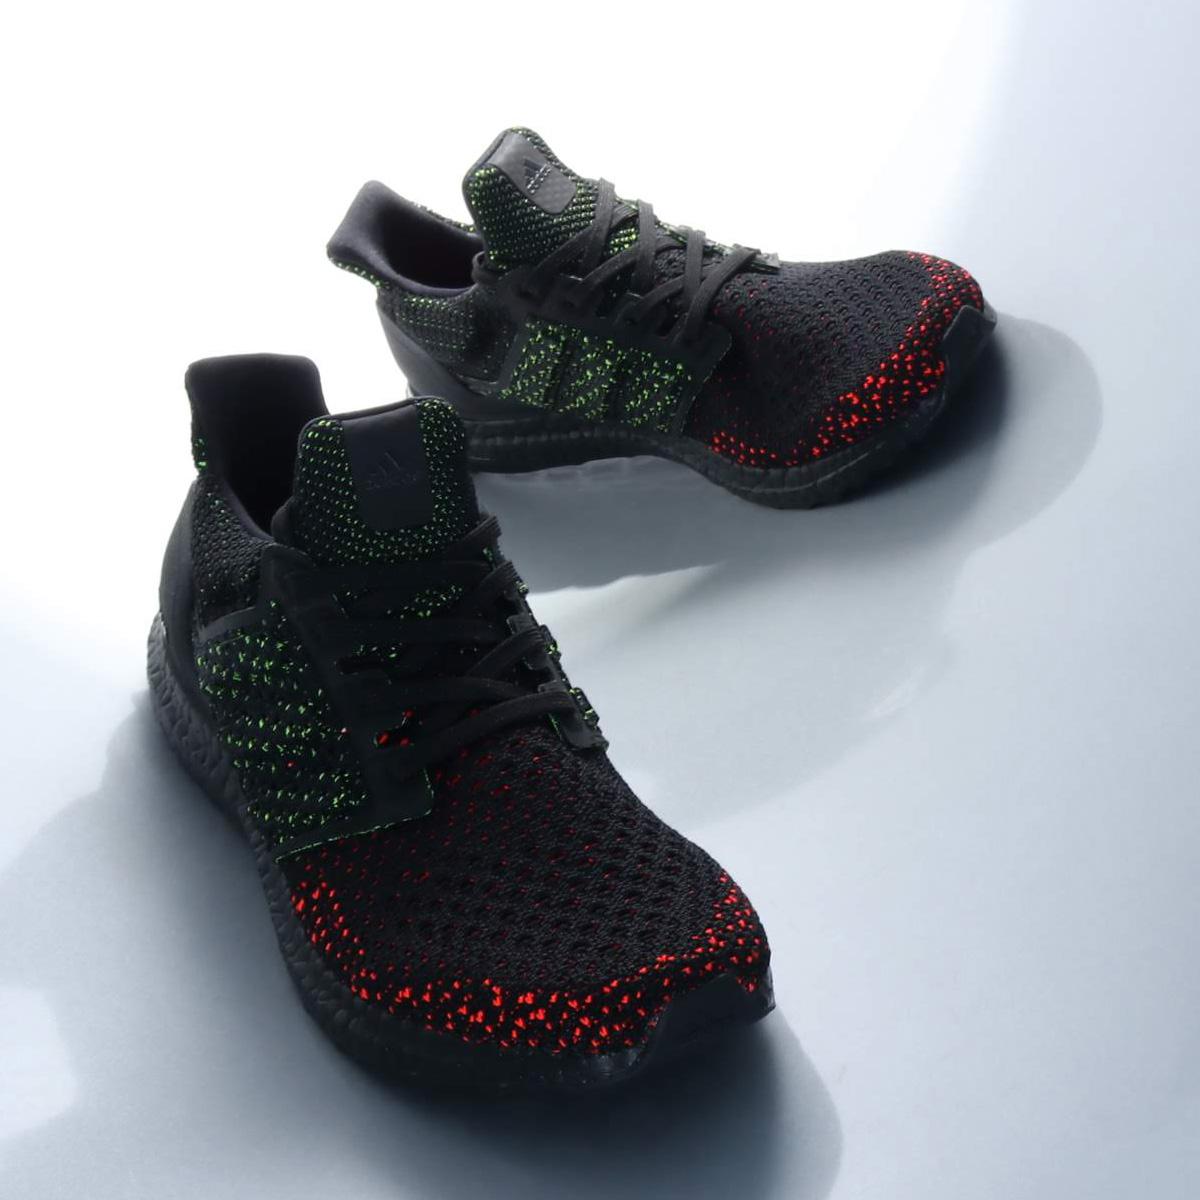 adidas UltraBOOST CLIMA(アディダス ウルトラブーストクライマ)Core Black/Core Black/Solar Red【メンズ スニーカー】18FW-I